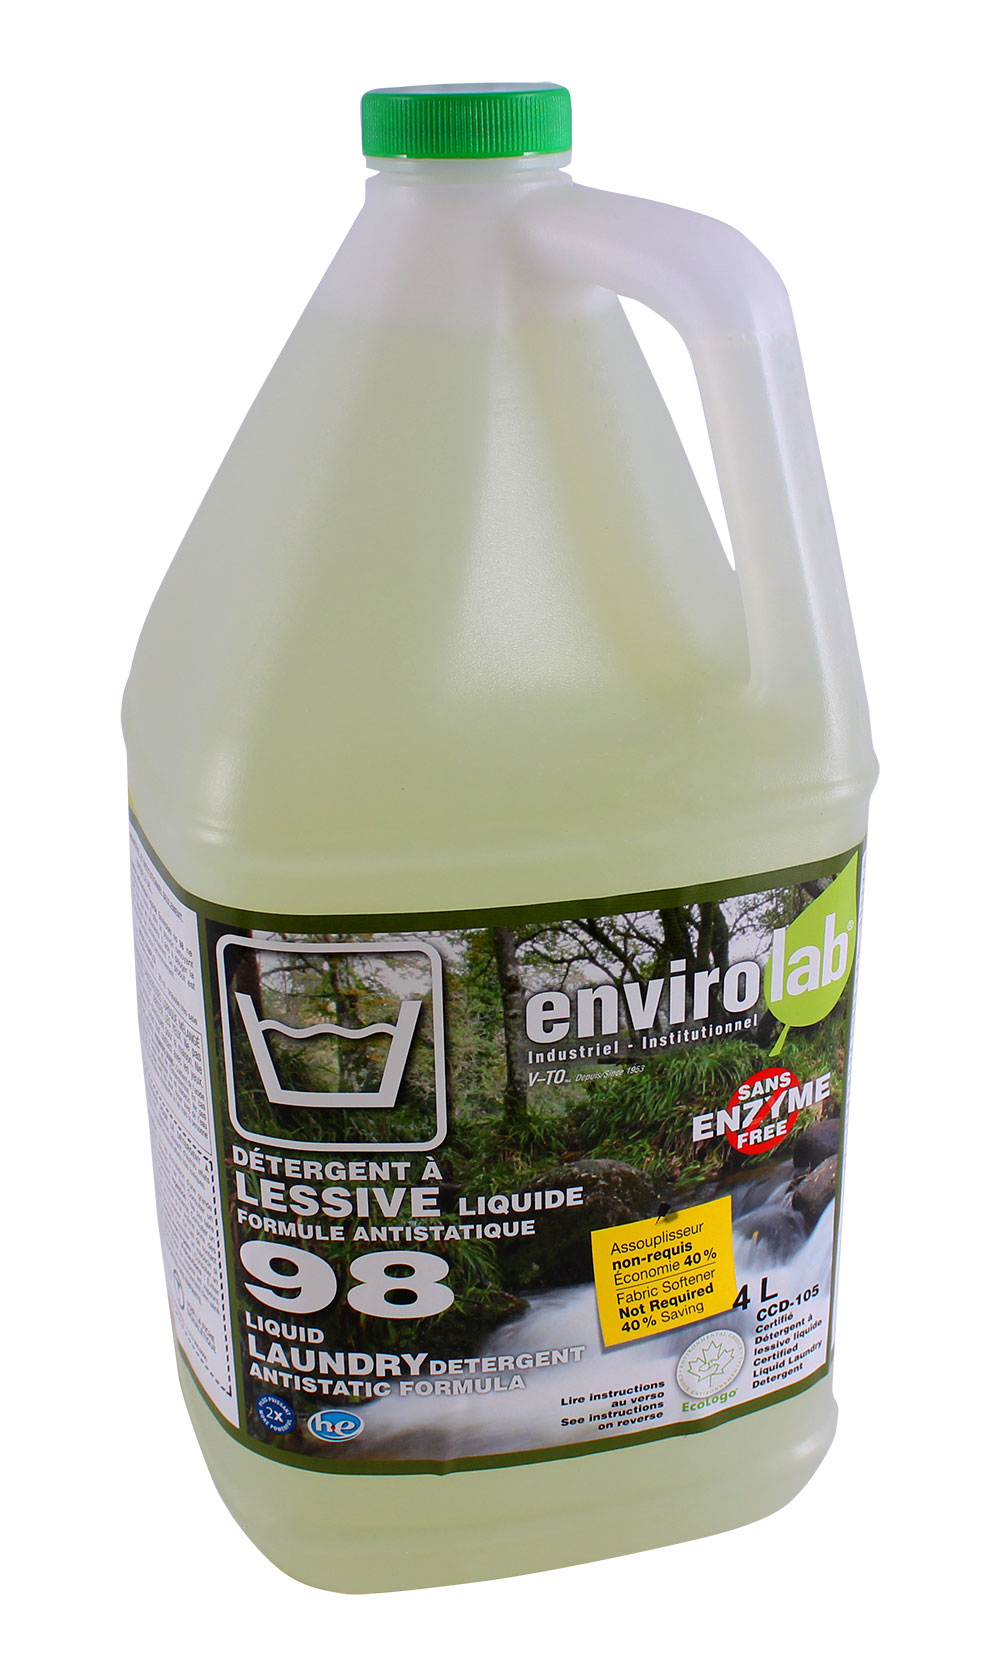 Envirolab 98 – Liquide lessives antistatiques, biodégradable